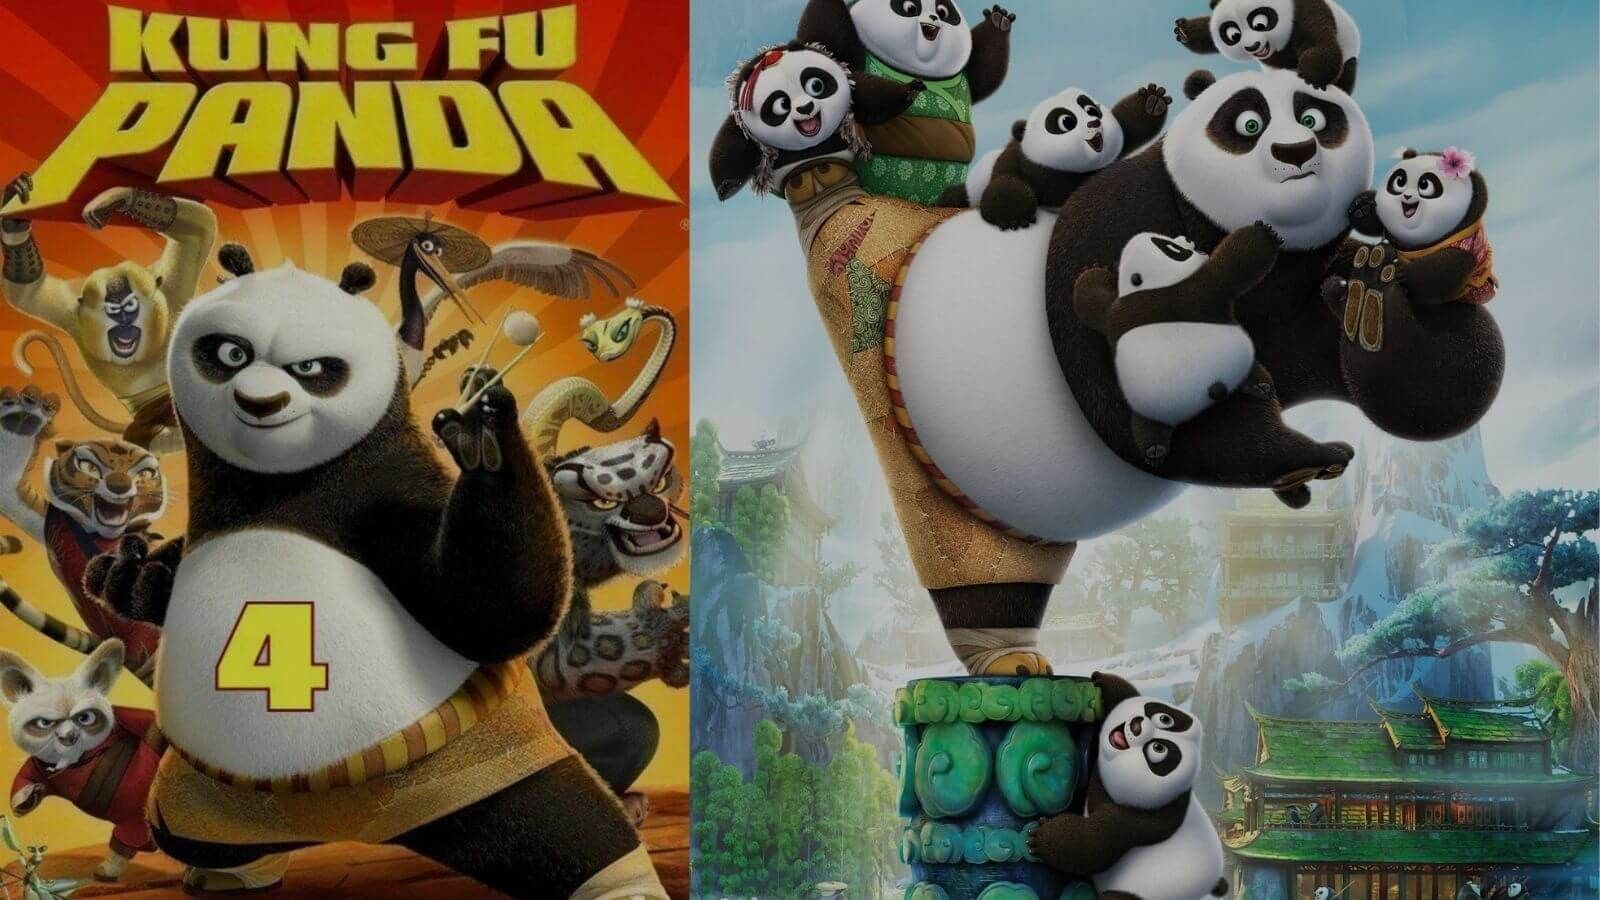 Kung Fu Panda 4 Trailer To Premiere Soon Here S What The Dreams Work Ceo Jeffrey Katzenberg Has To Say Kung Fu Panda Kung Fu Panda